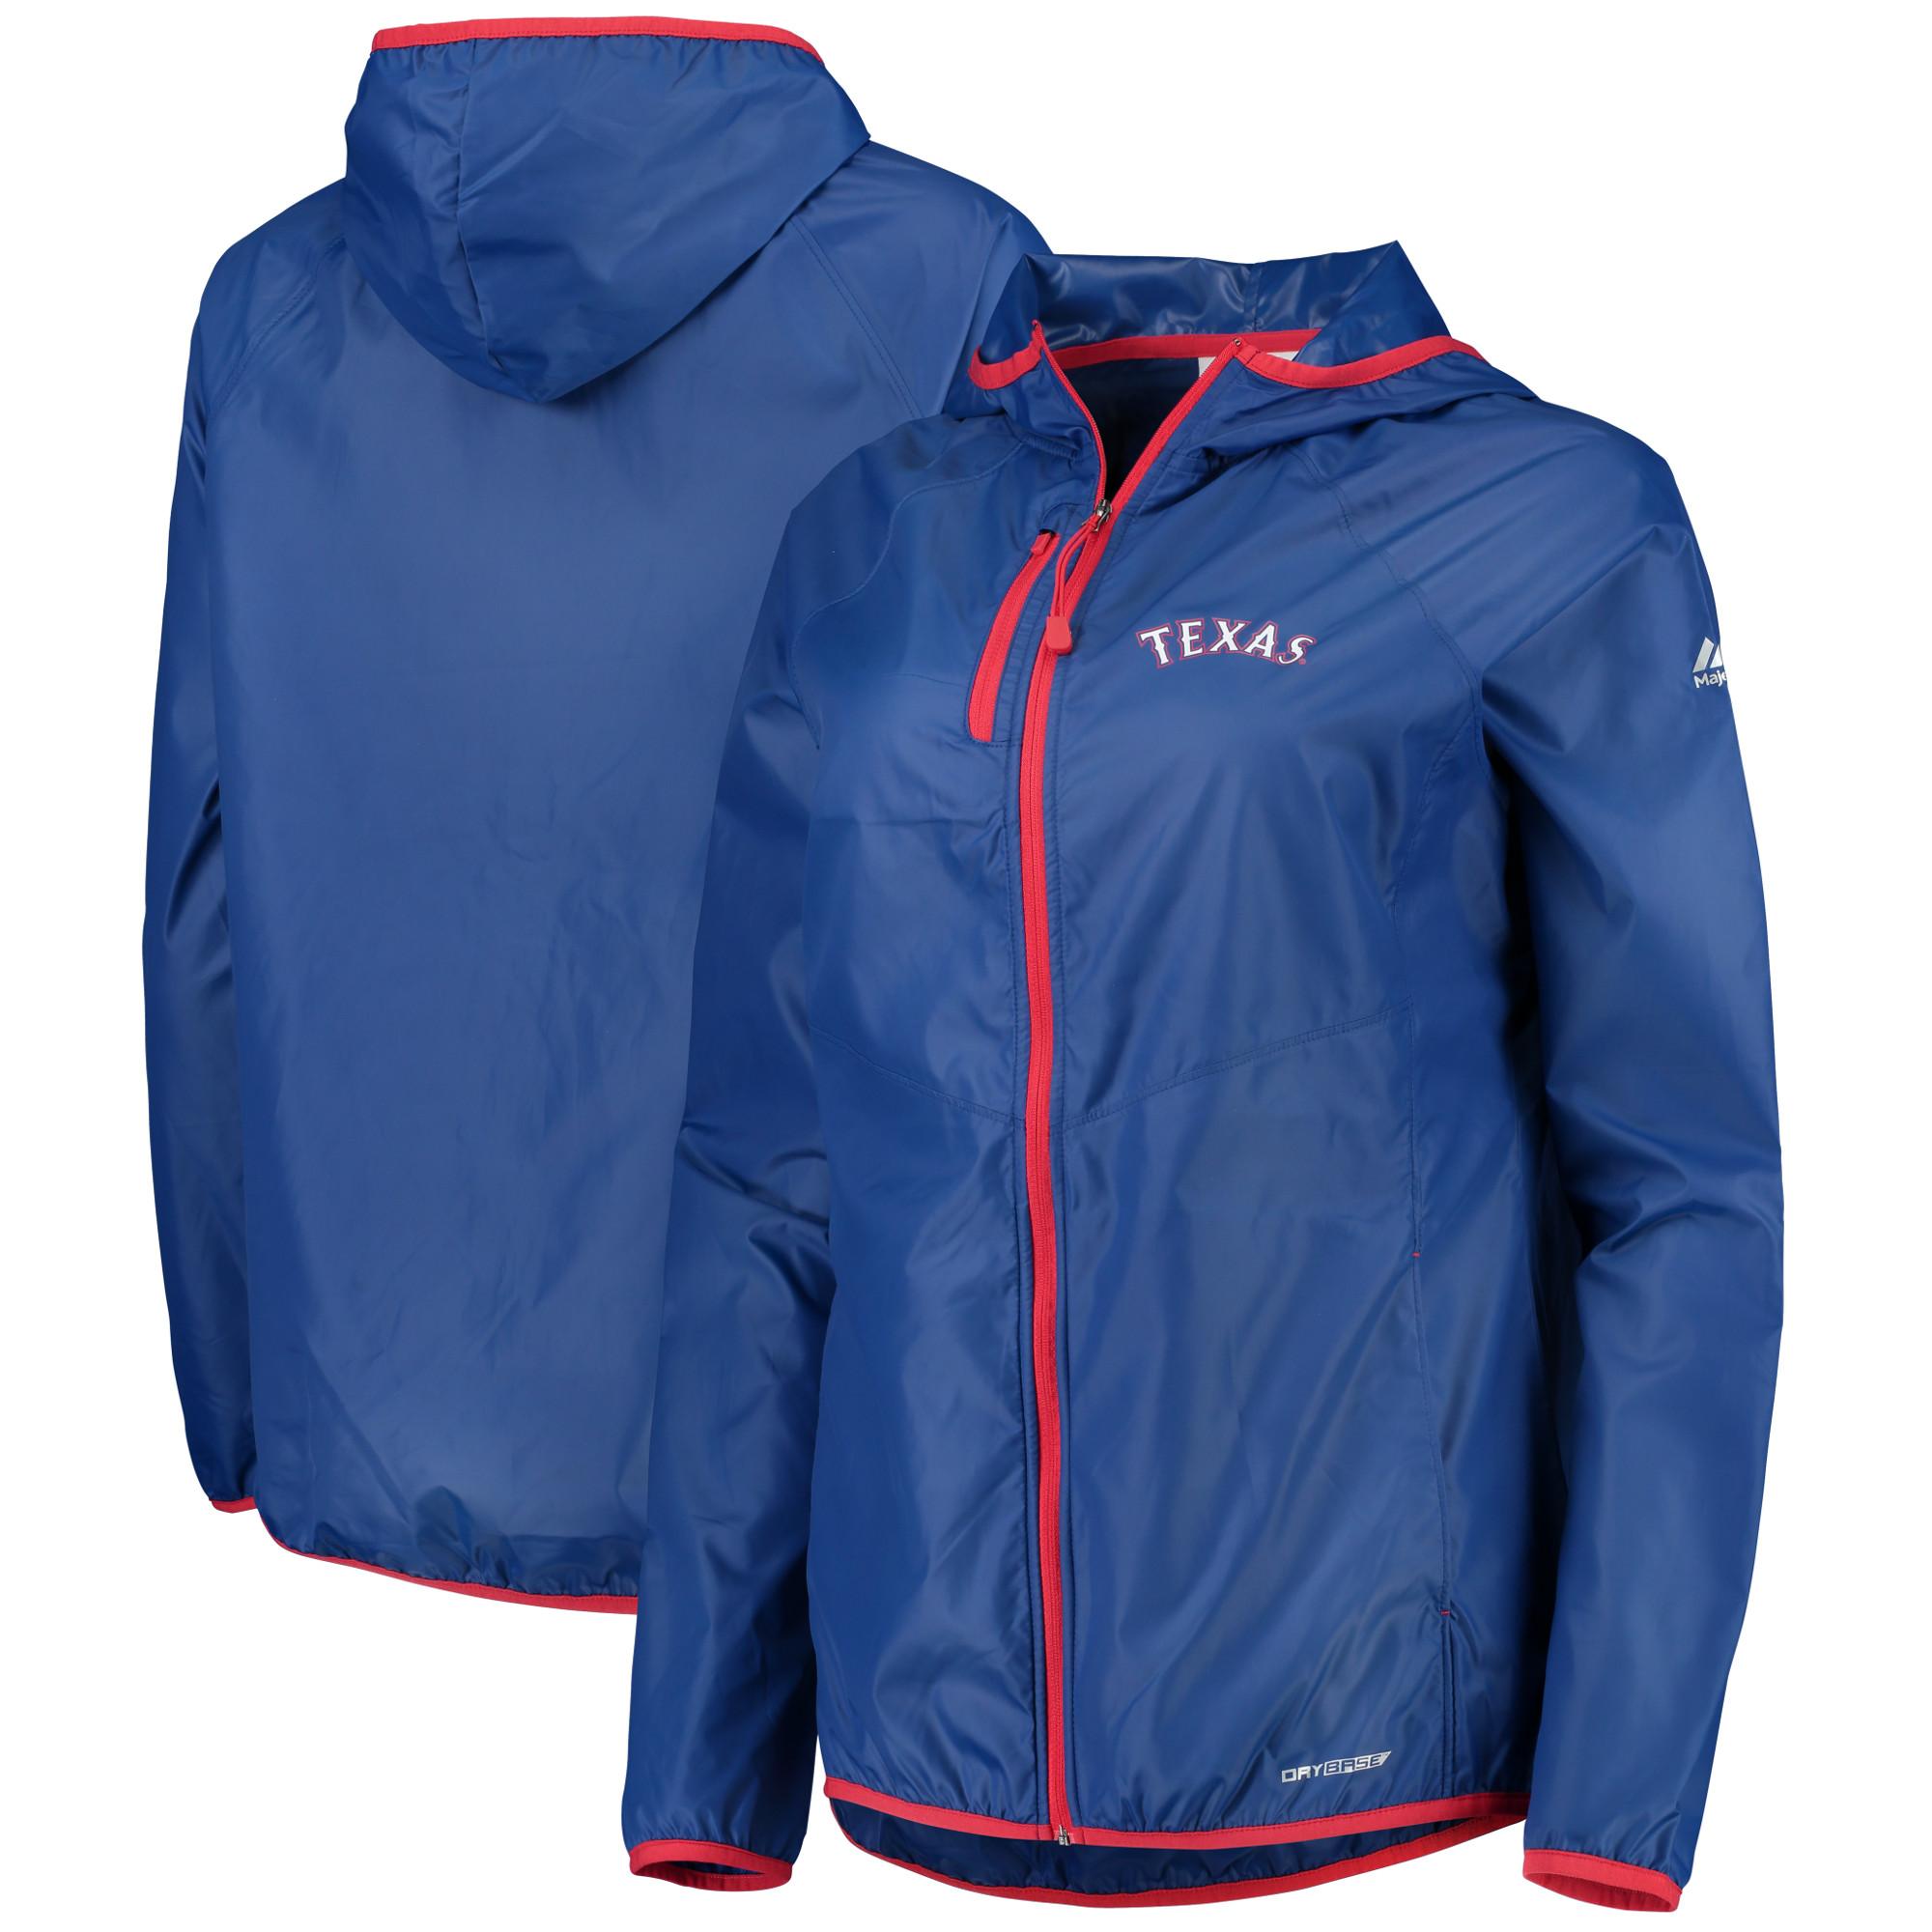 Texas Rangers Majestic Women's Absolute Dominance Dry Base Full-Zip Jacket - Royal